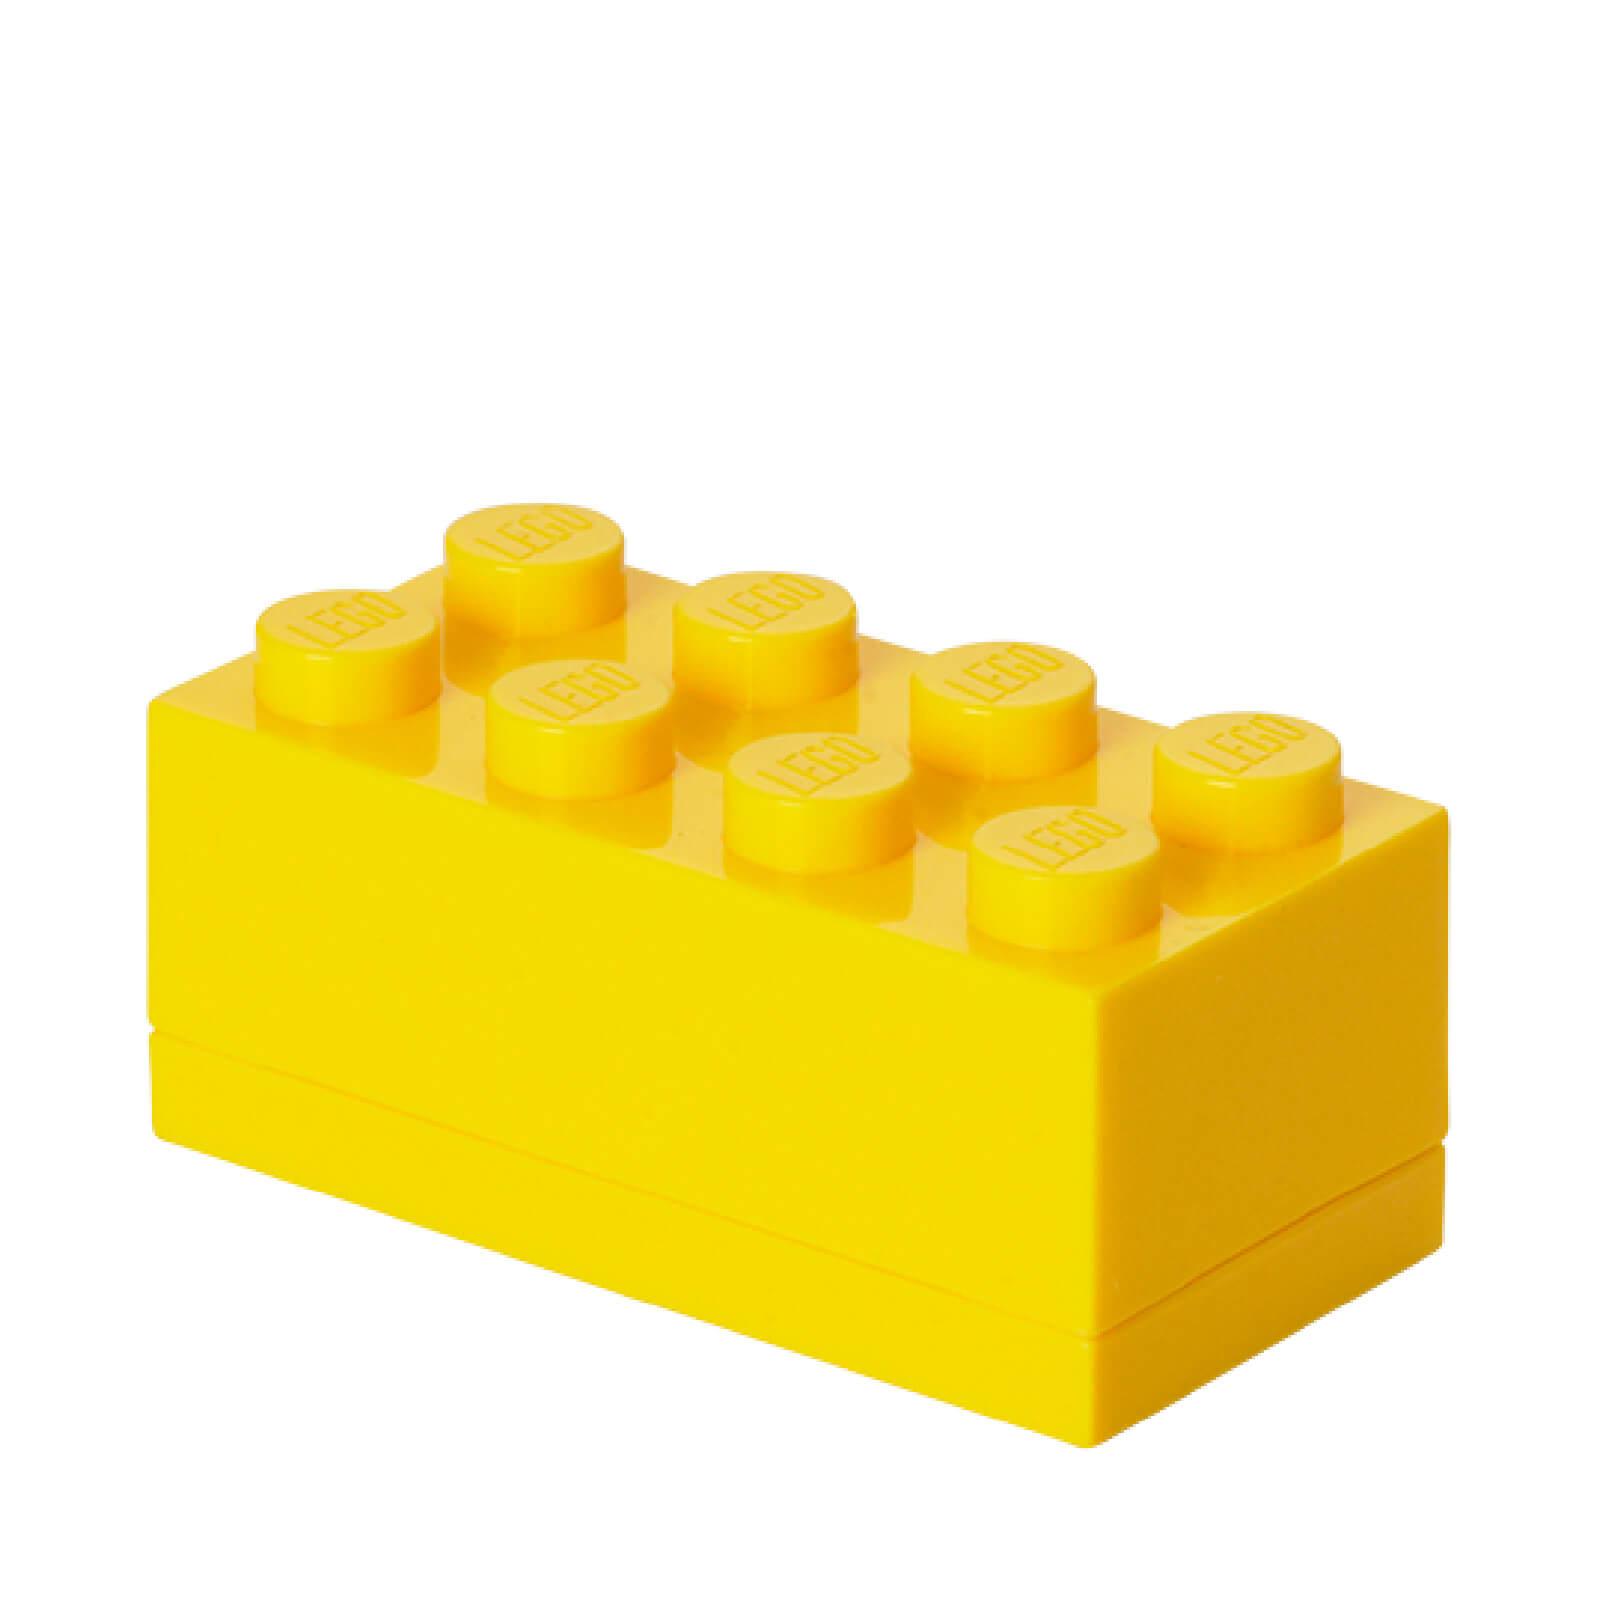 Lego Mini Box 8 - Bright Yellow